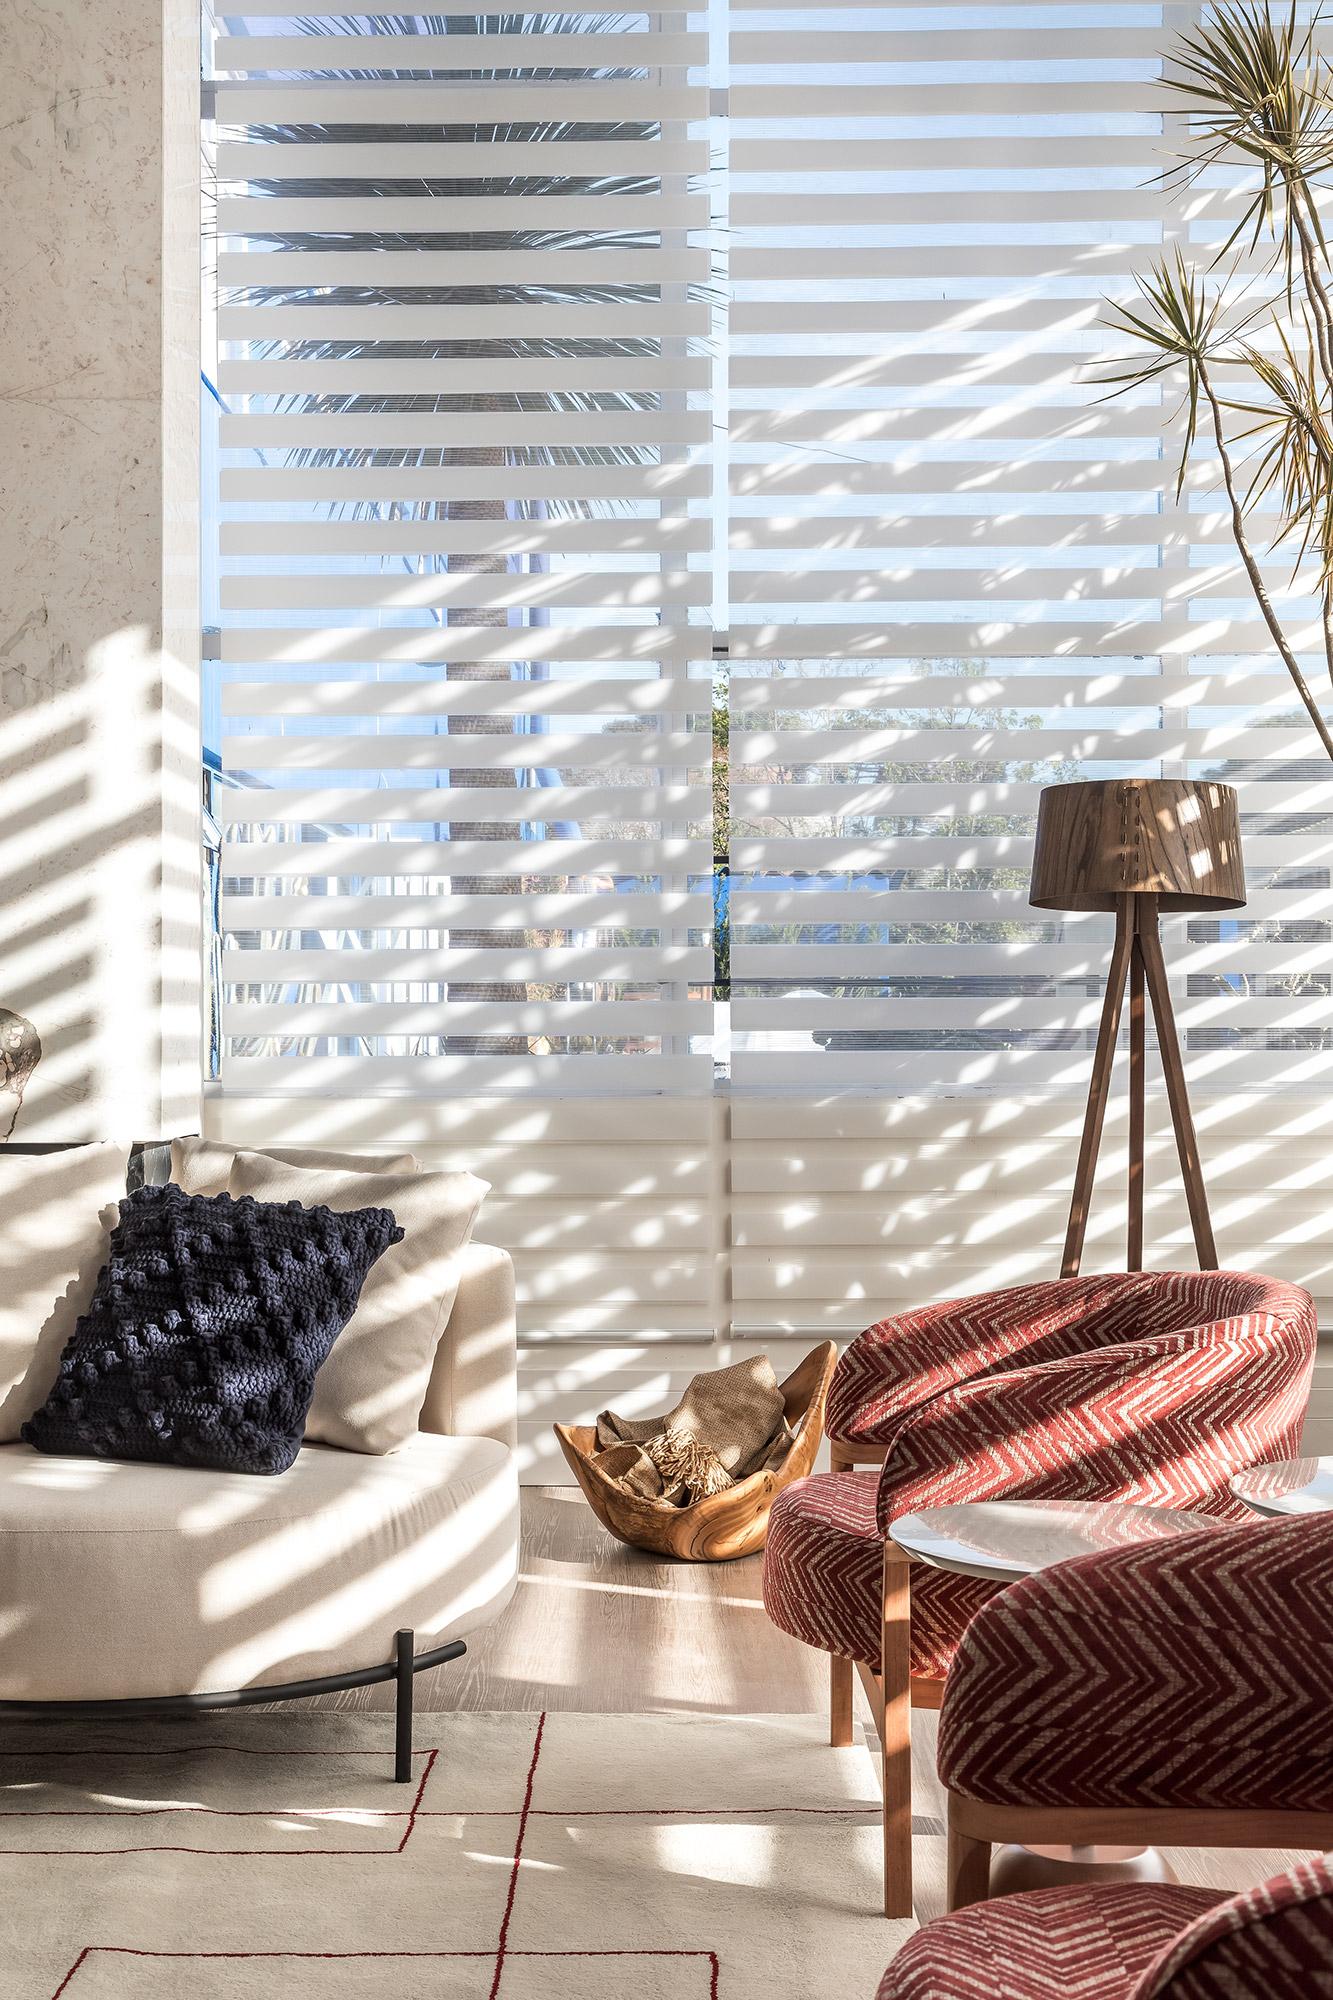 Living Pormade Christian Schonhofen Richard Schonhofen CASACOR Paraná 2021 sala decoracao decor design